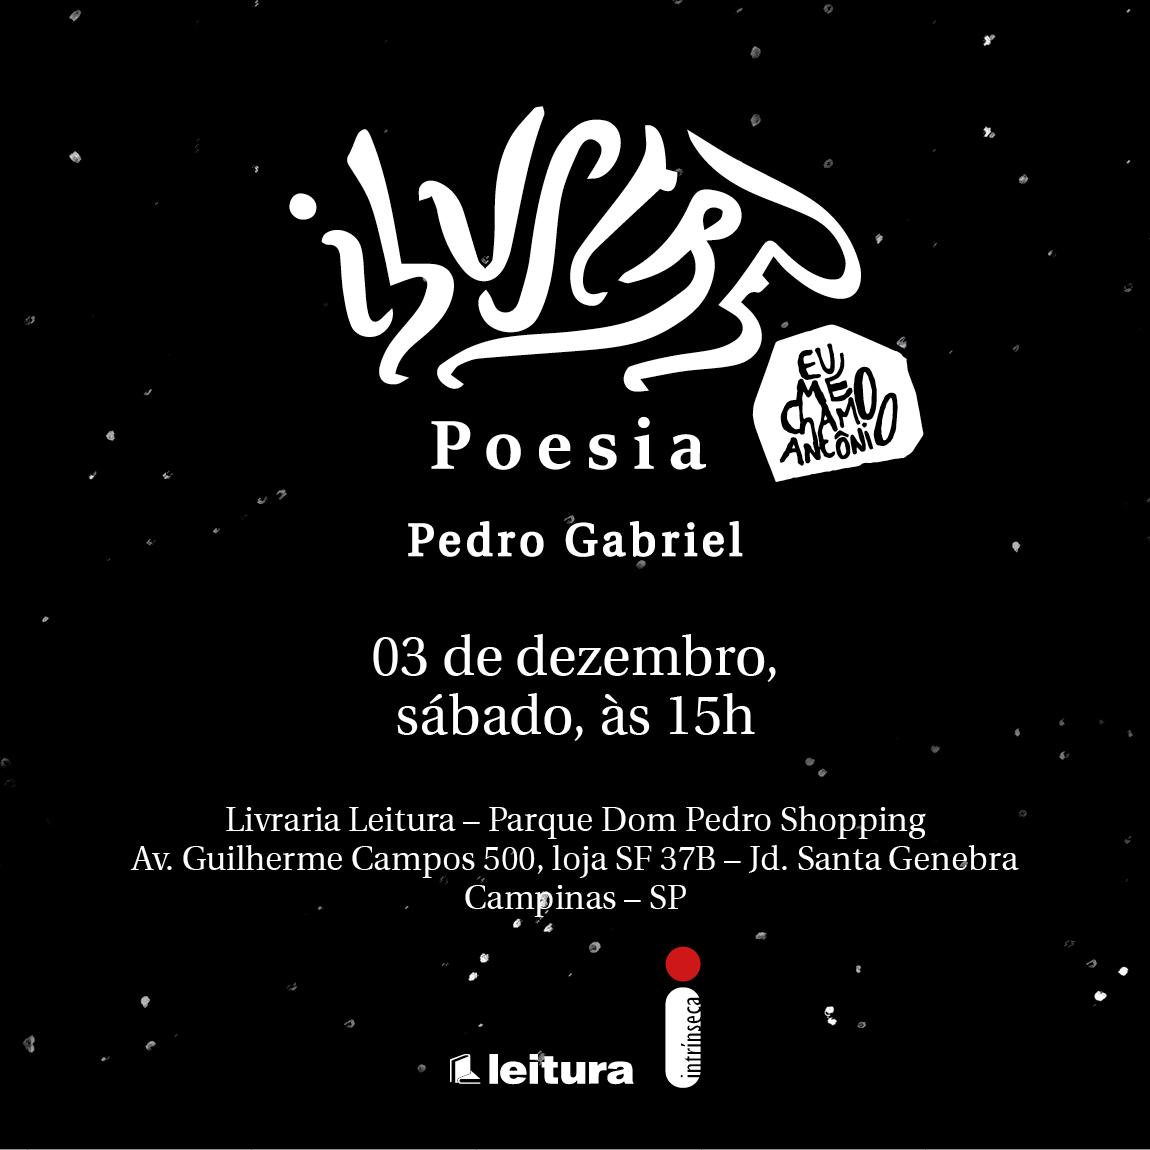 convite_ilustrepoesia_campinas2